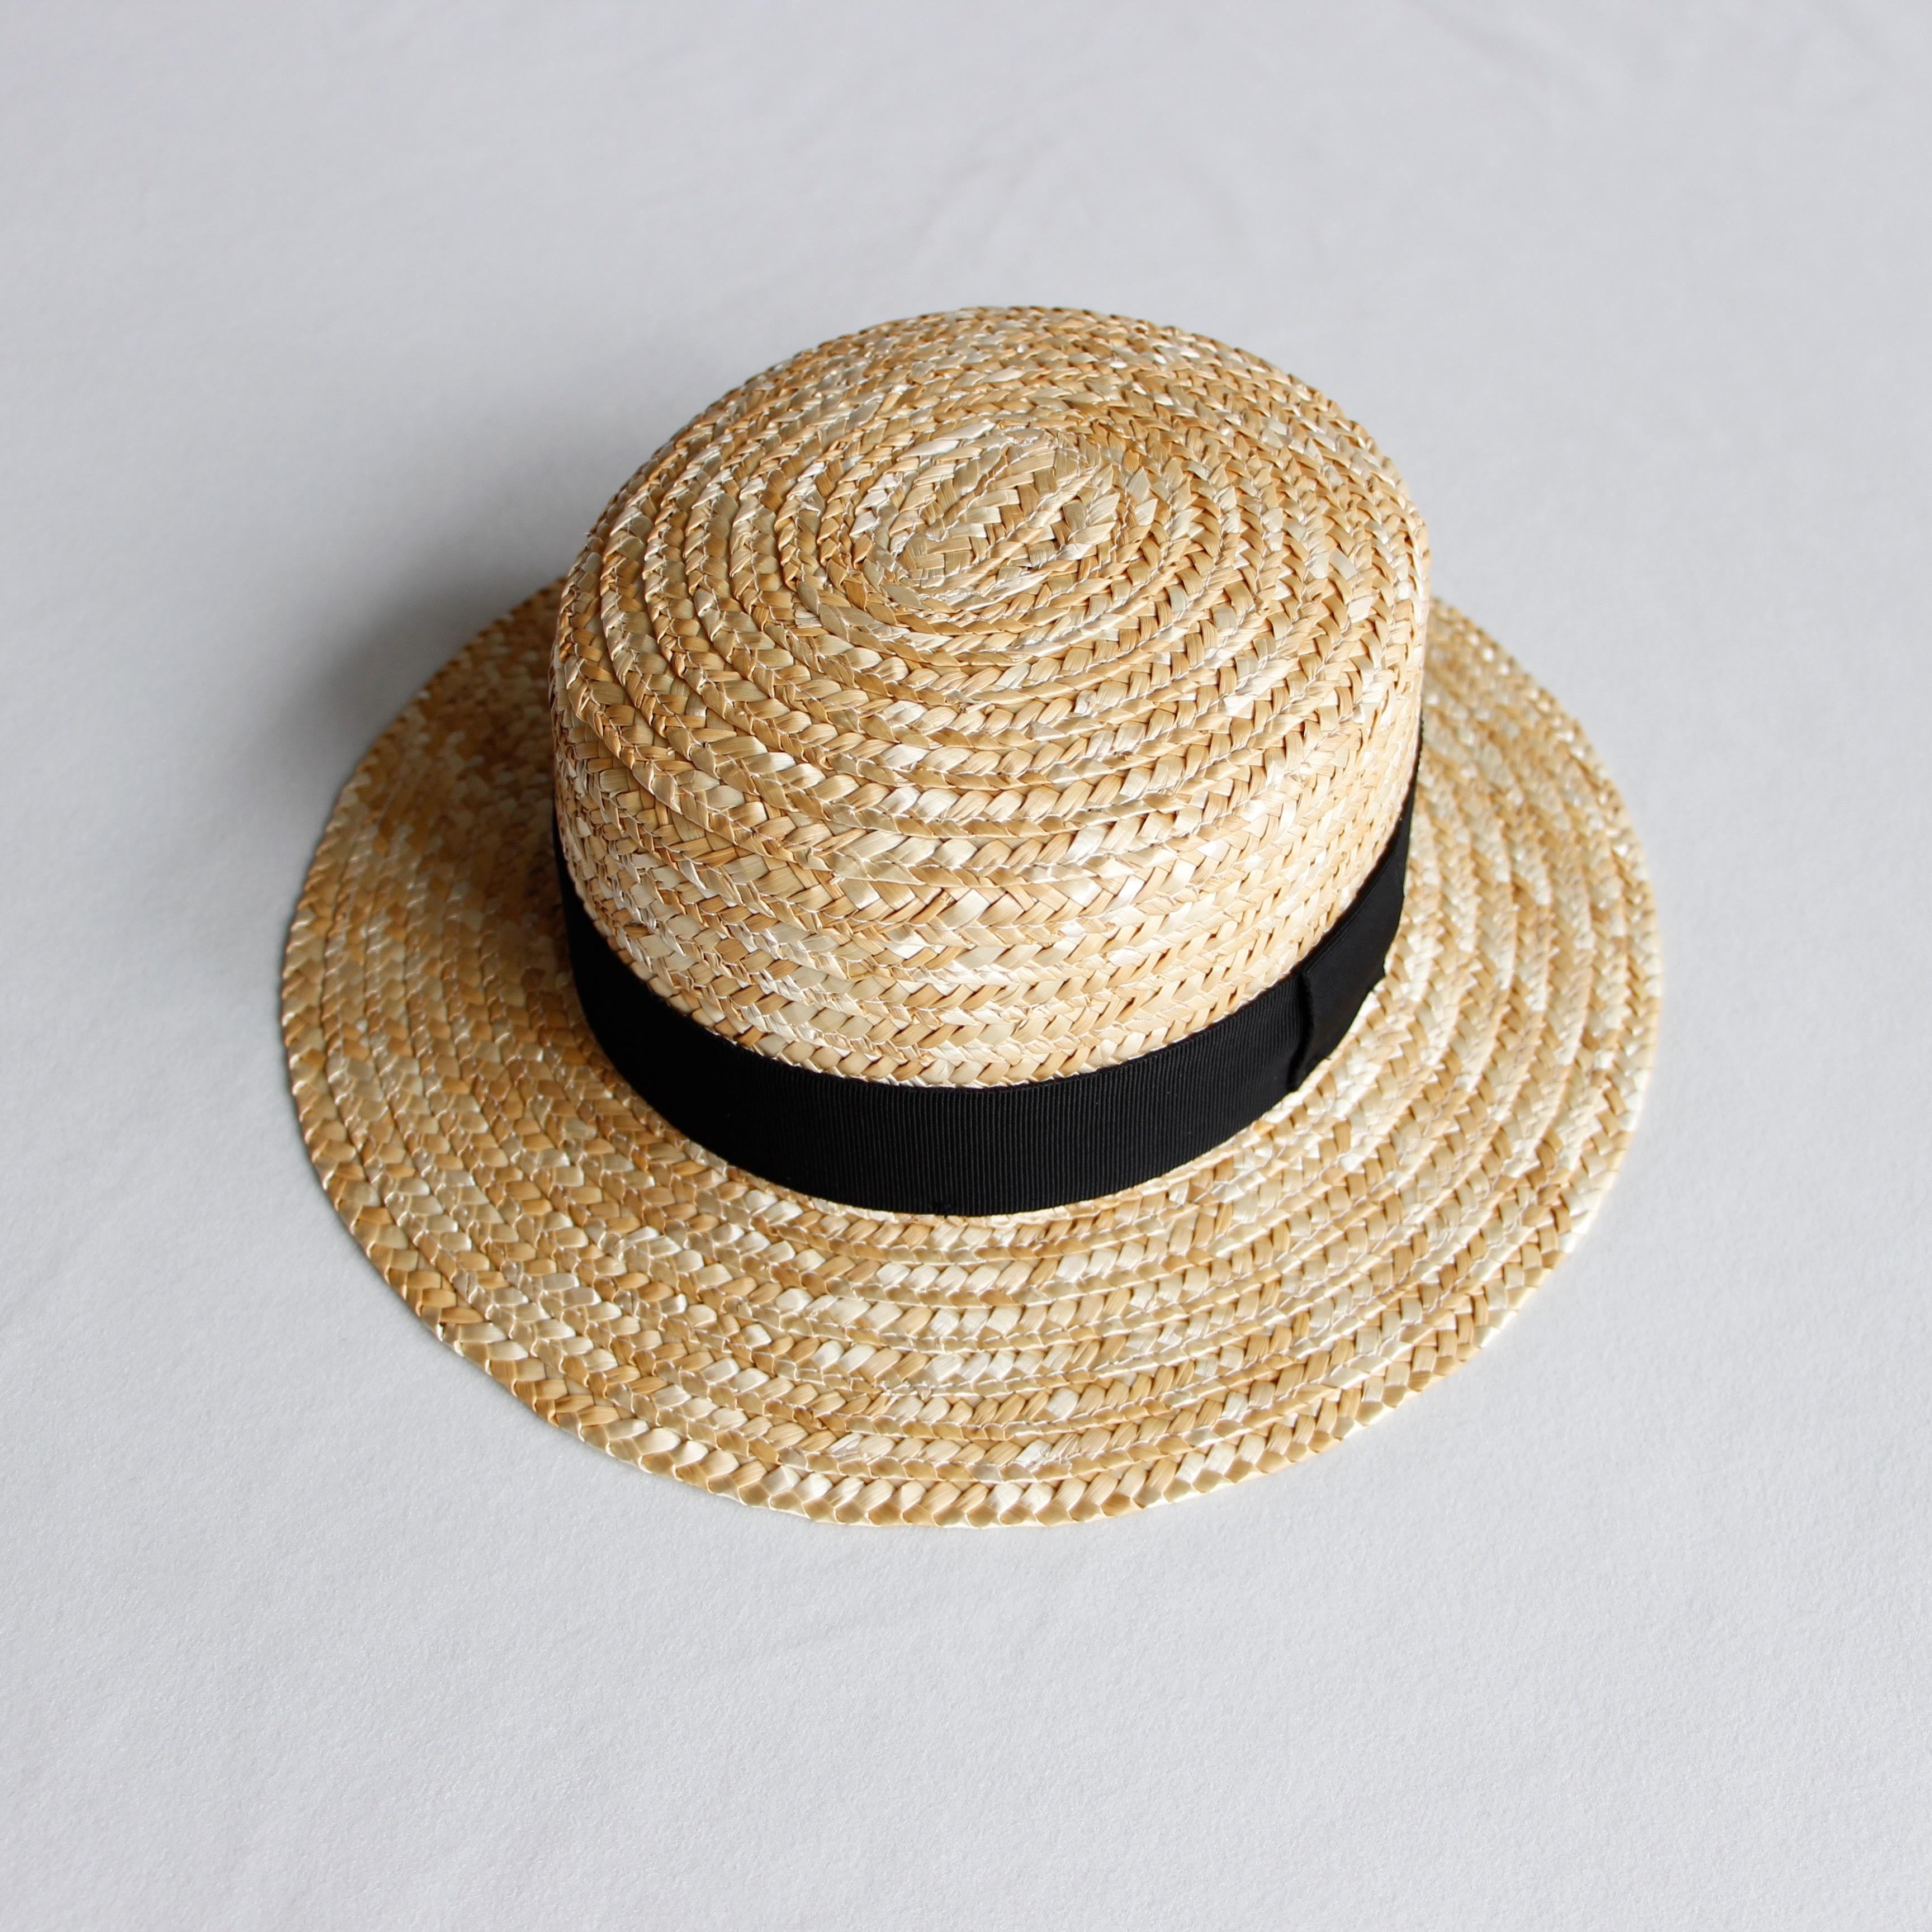 《Willys》CANOTIER カンカン帽 / 50-56cm